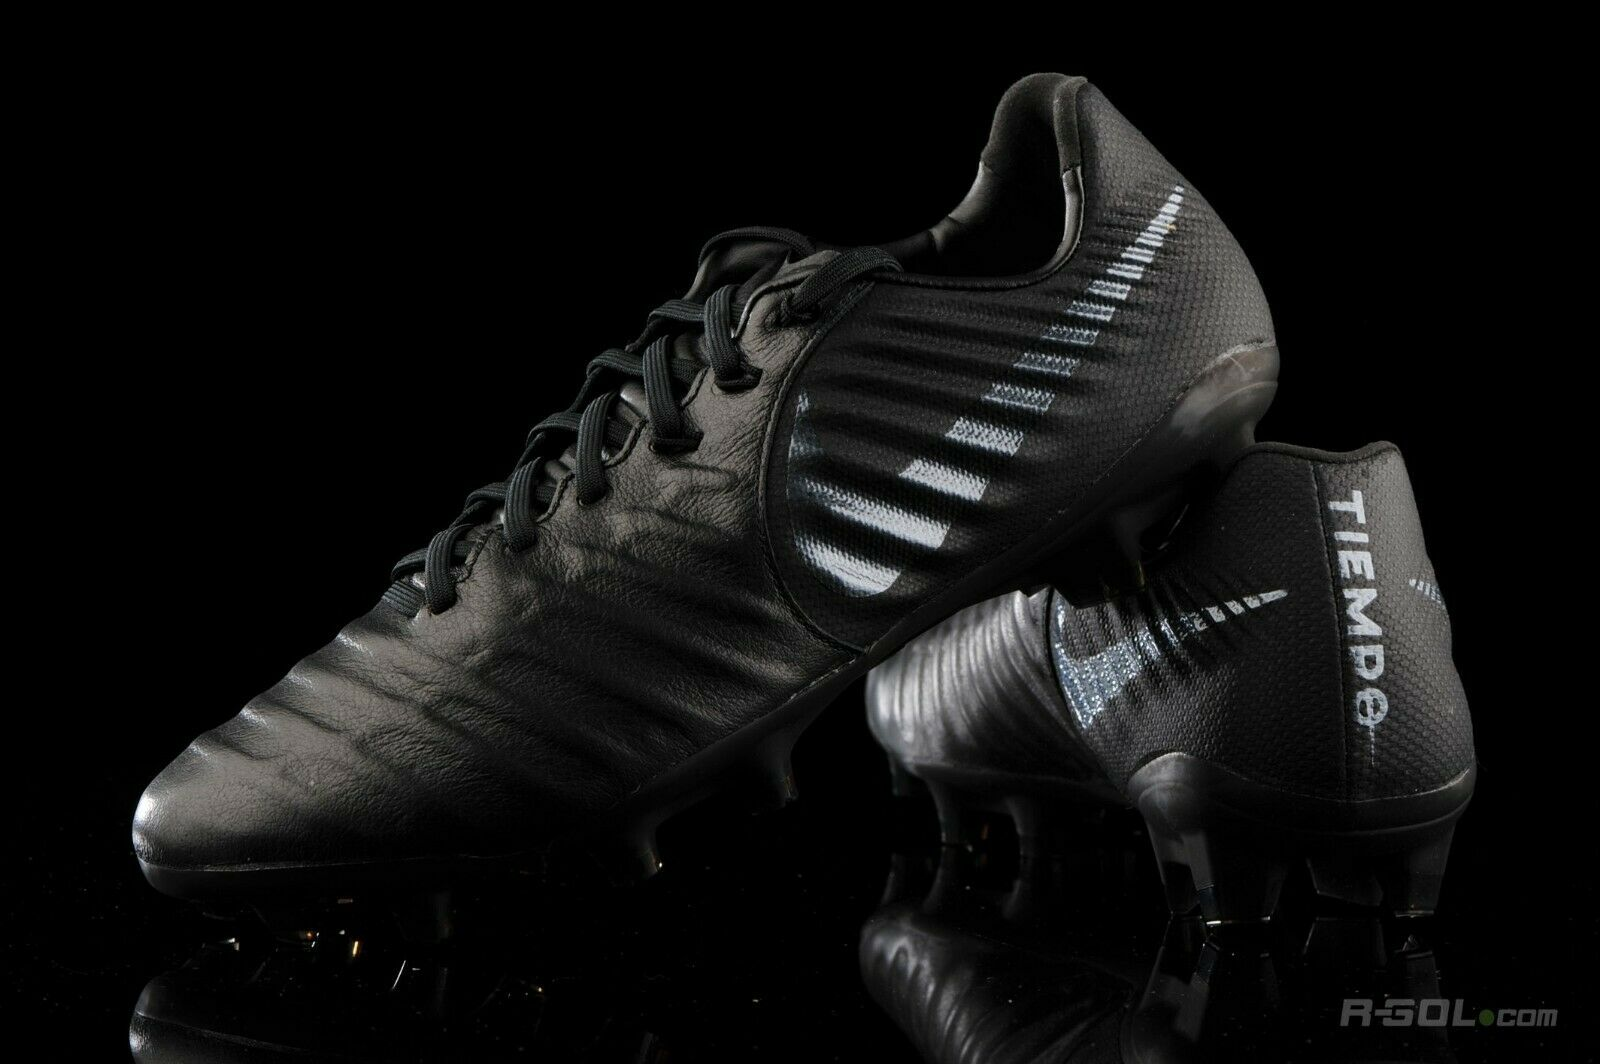 Nike Tiempo Legend 7 VII Pro FG Soccer Cleats Kangaroo Leather Black AH7241-001